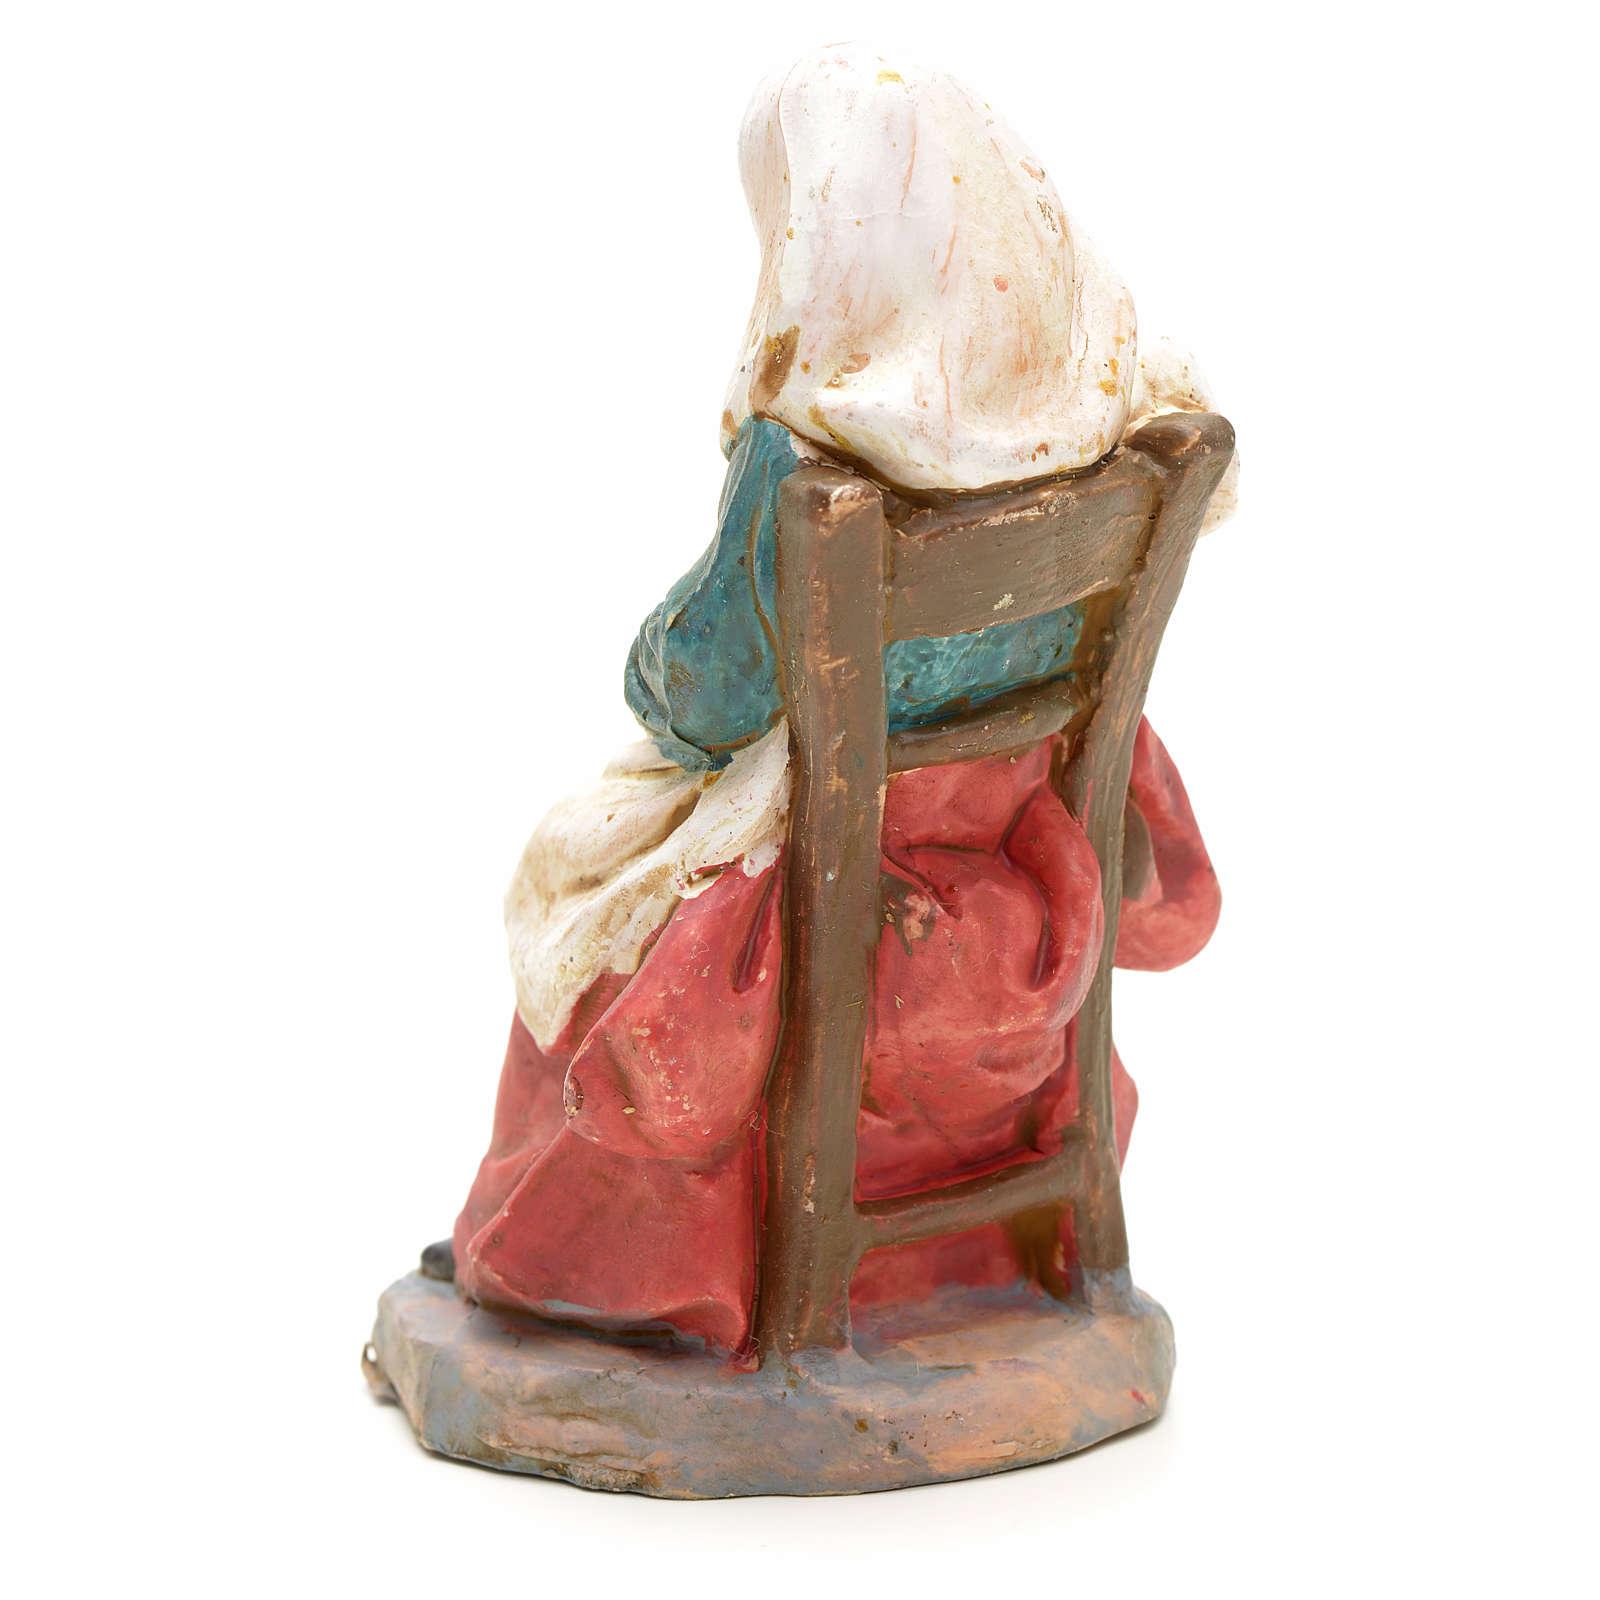 Nativity set accessory, Woman sitting with pan figurine 3